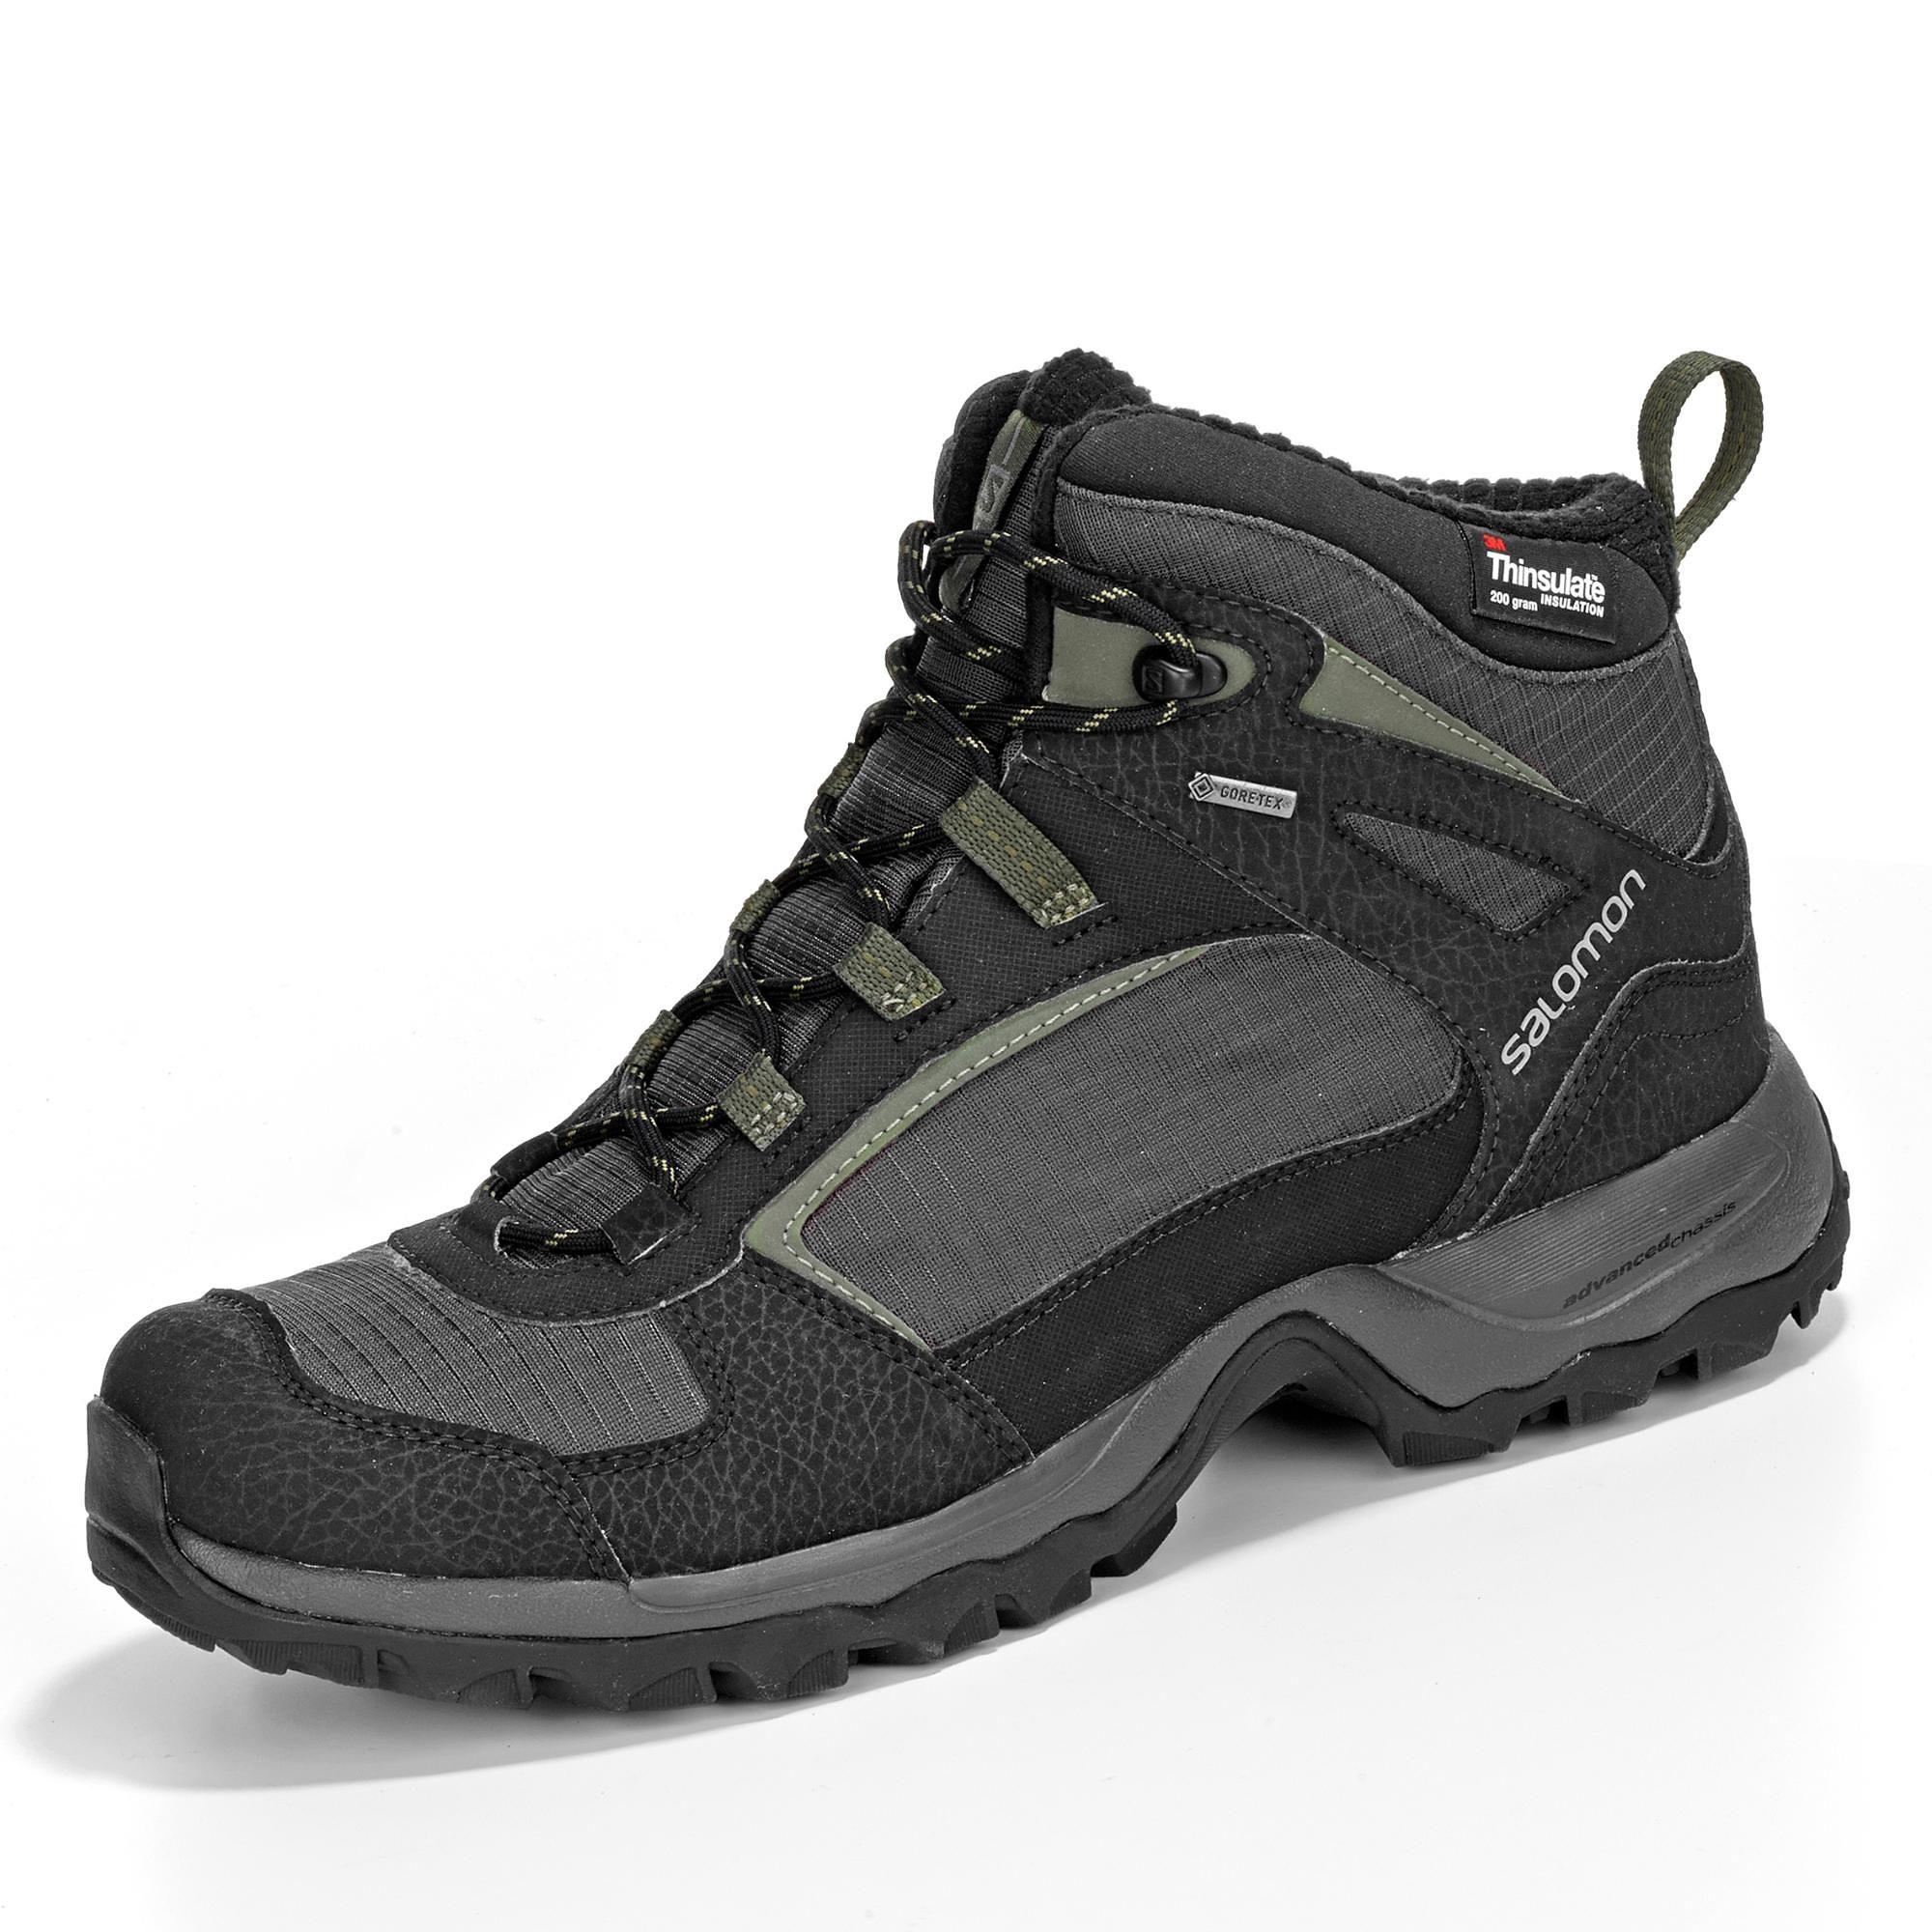 Salomon GORE-TEX® Winterboots